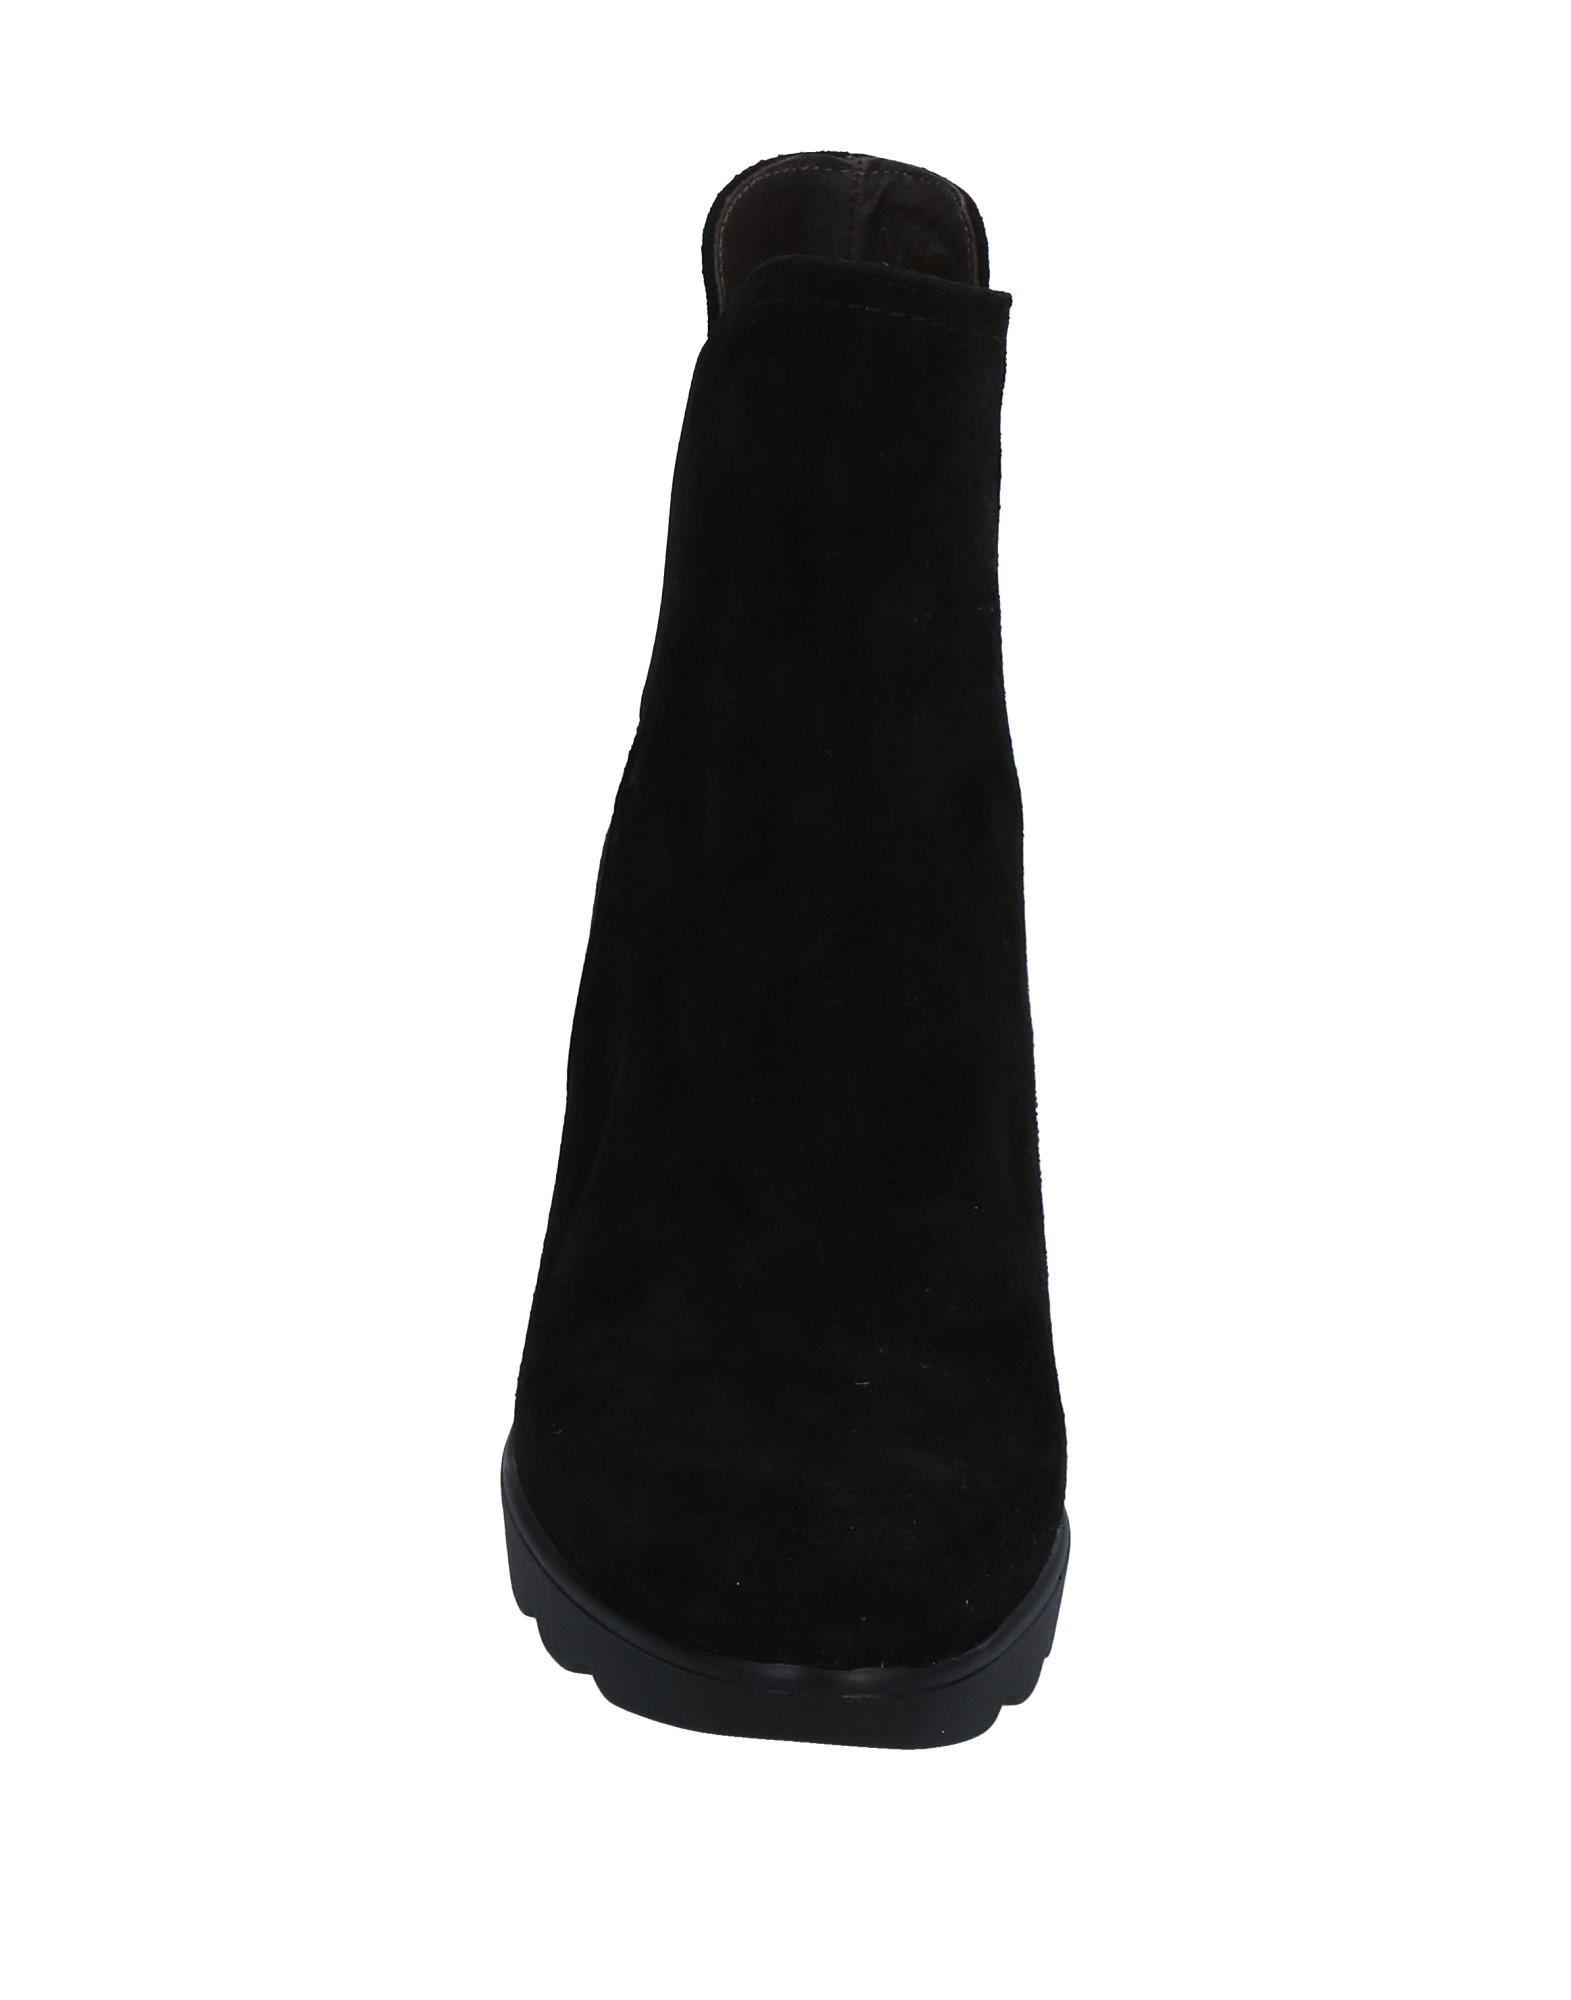 Toni Pons Stiefelette Damen  Schuhe 11517239LH Gute Qualität beliebte Schuhe  f995e7